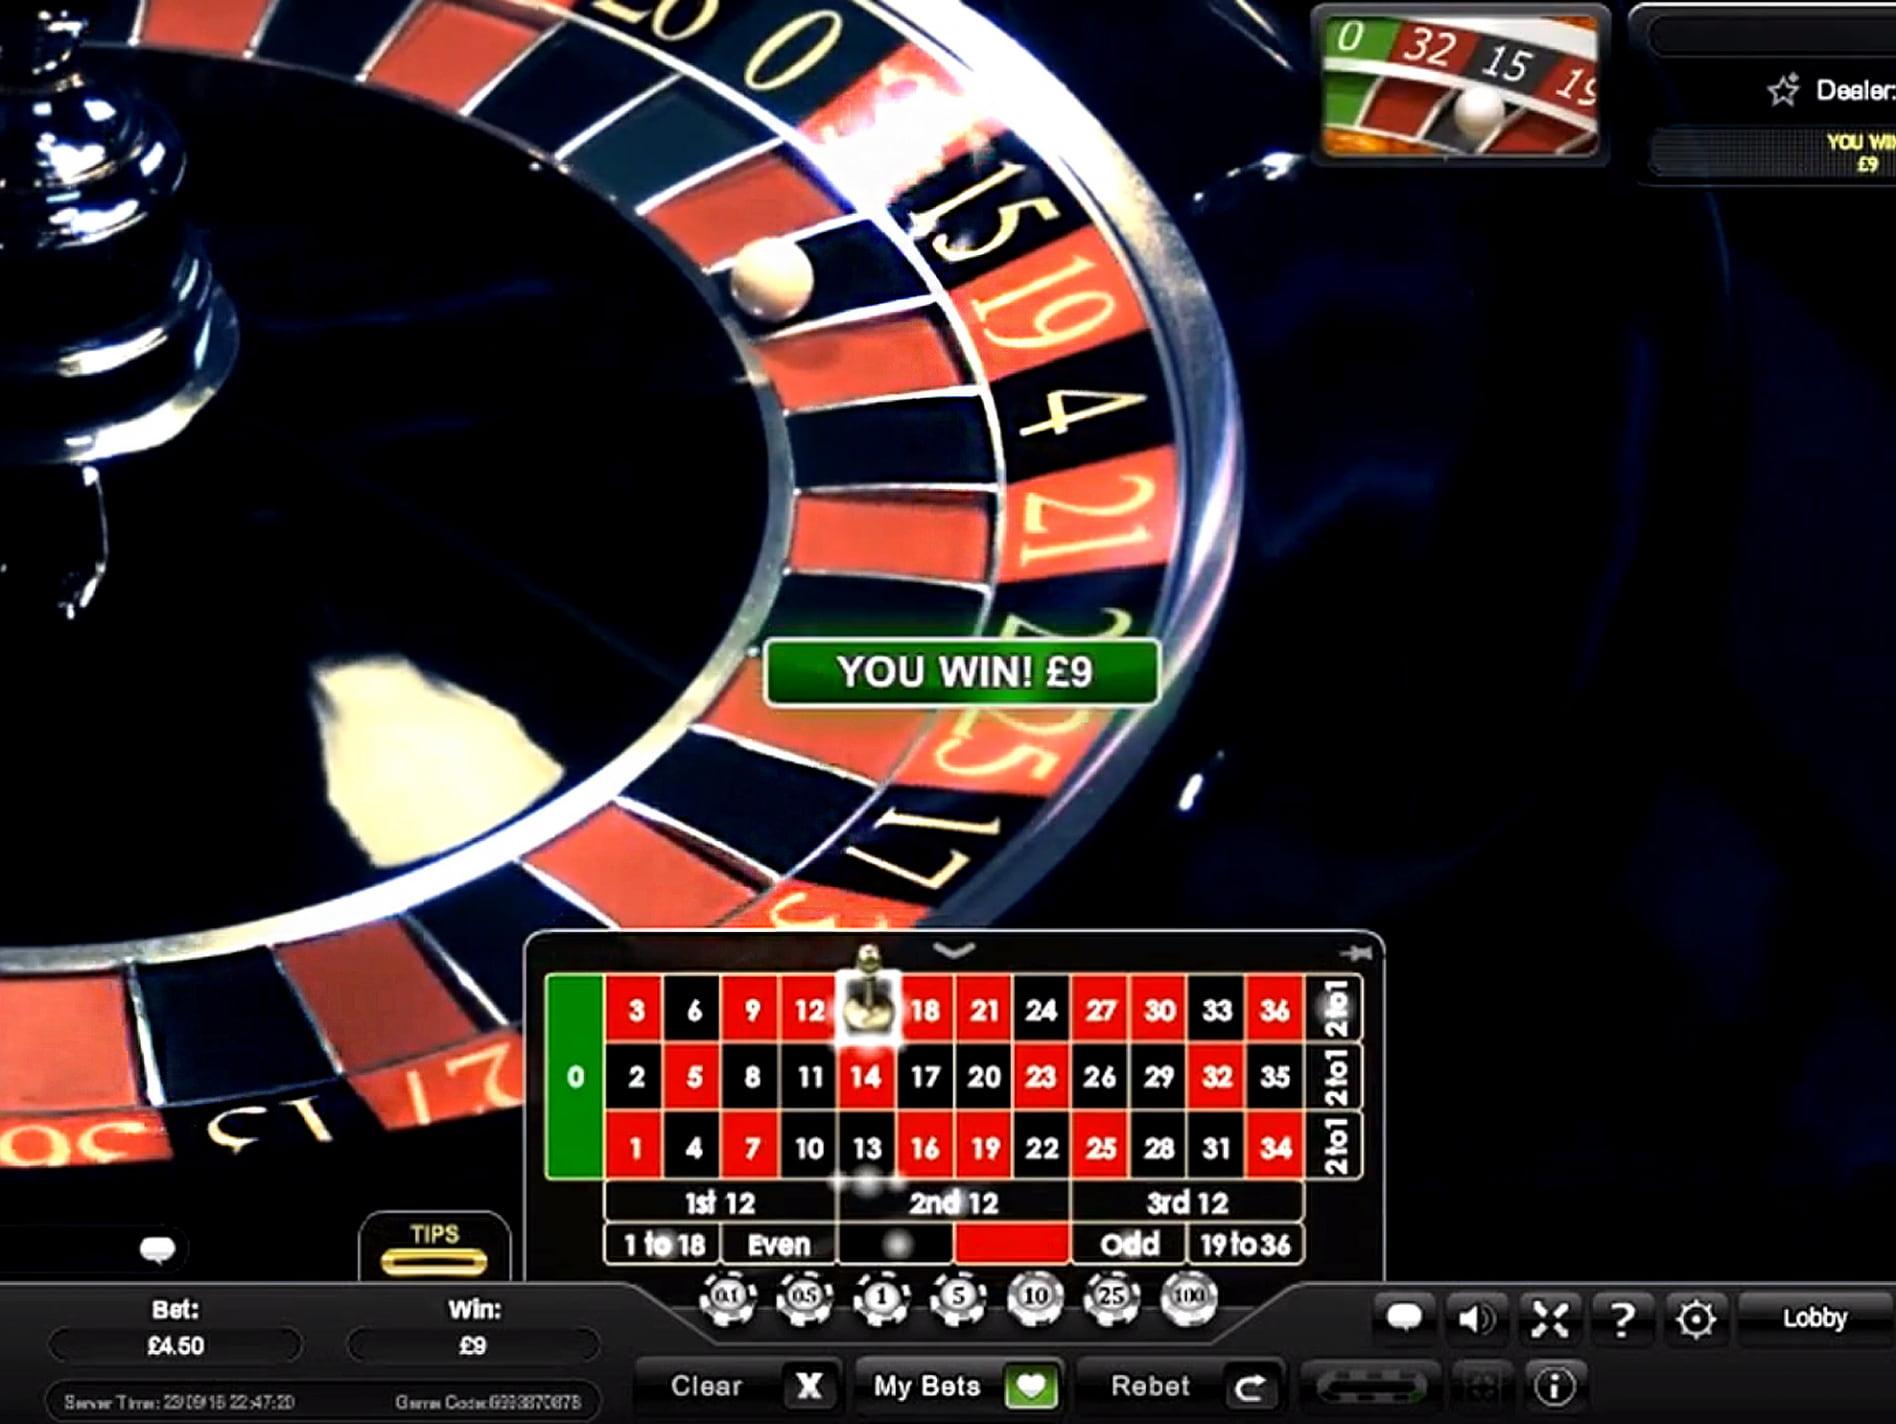 Vivo gratis bonos ruleta electronica 864823